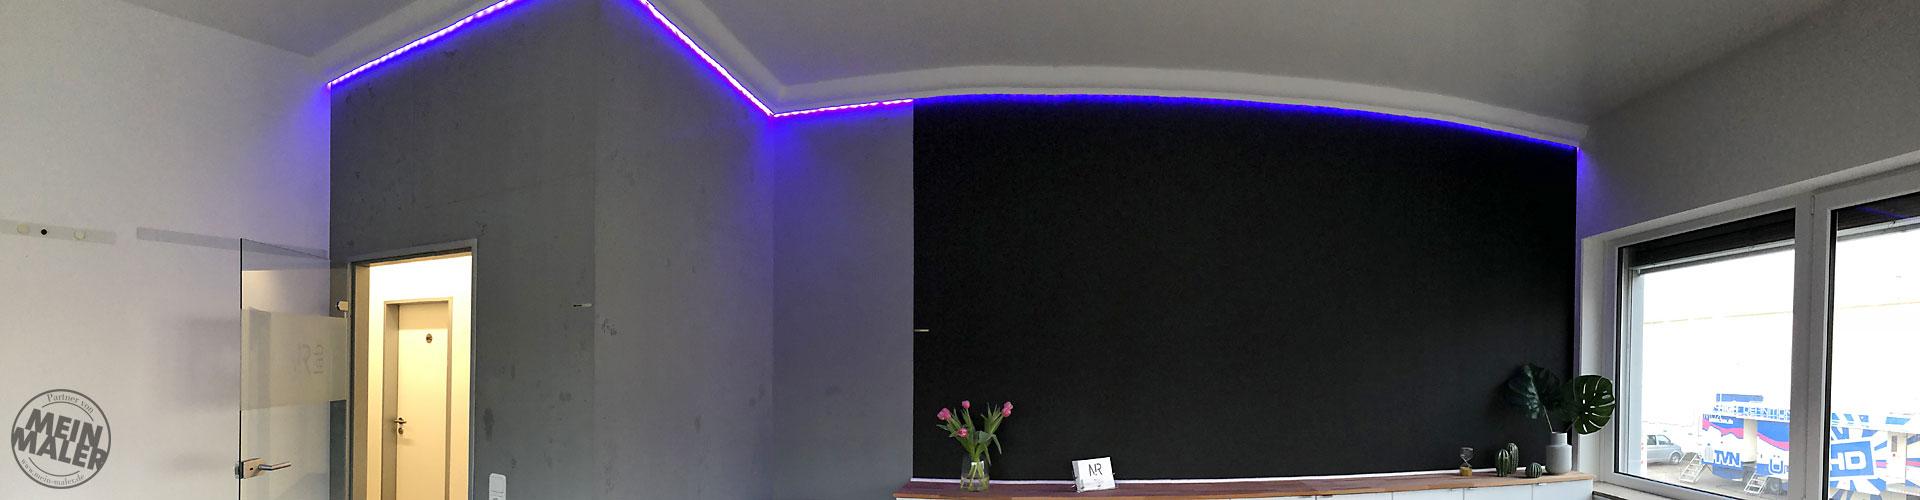 Gestaltung Mit Betonoptik Inkl Schalungsfuge Led Licht